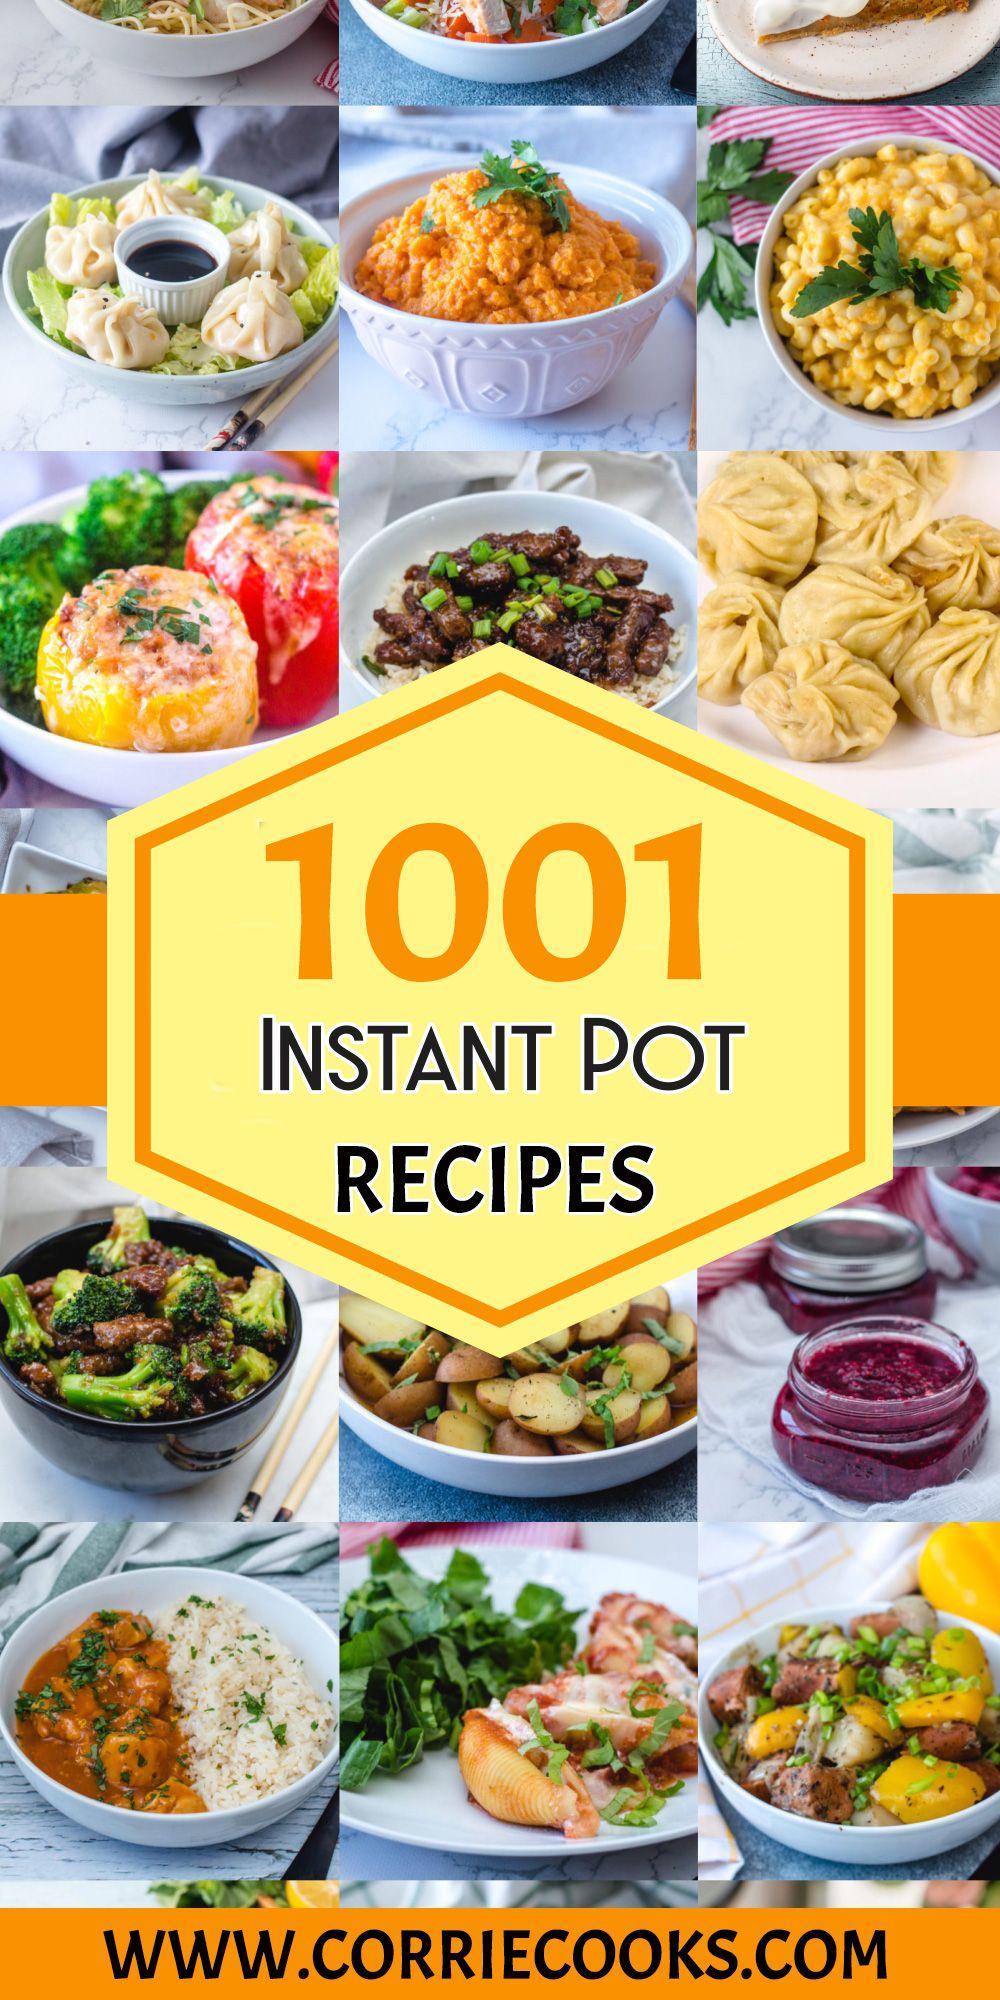 1001 Instant Pot Recipes - Corrie Cooks